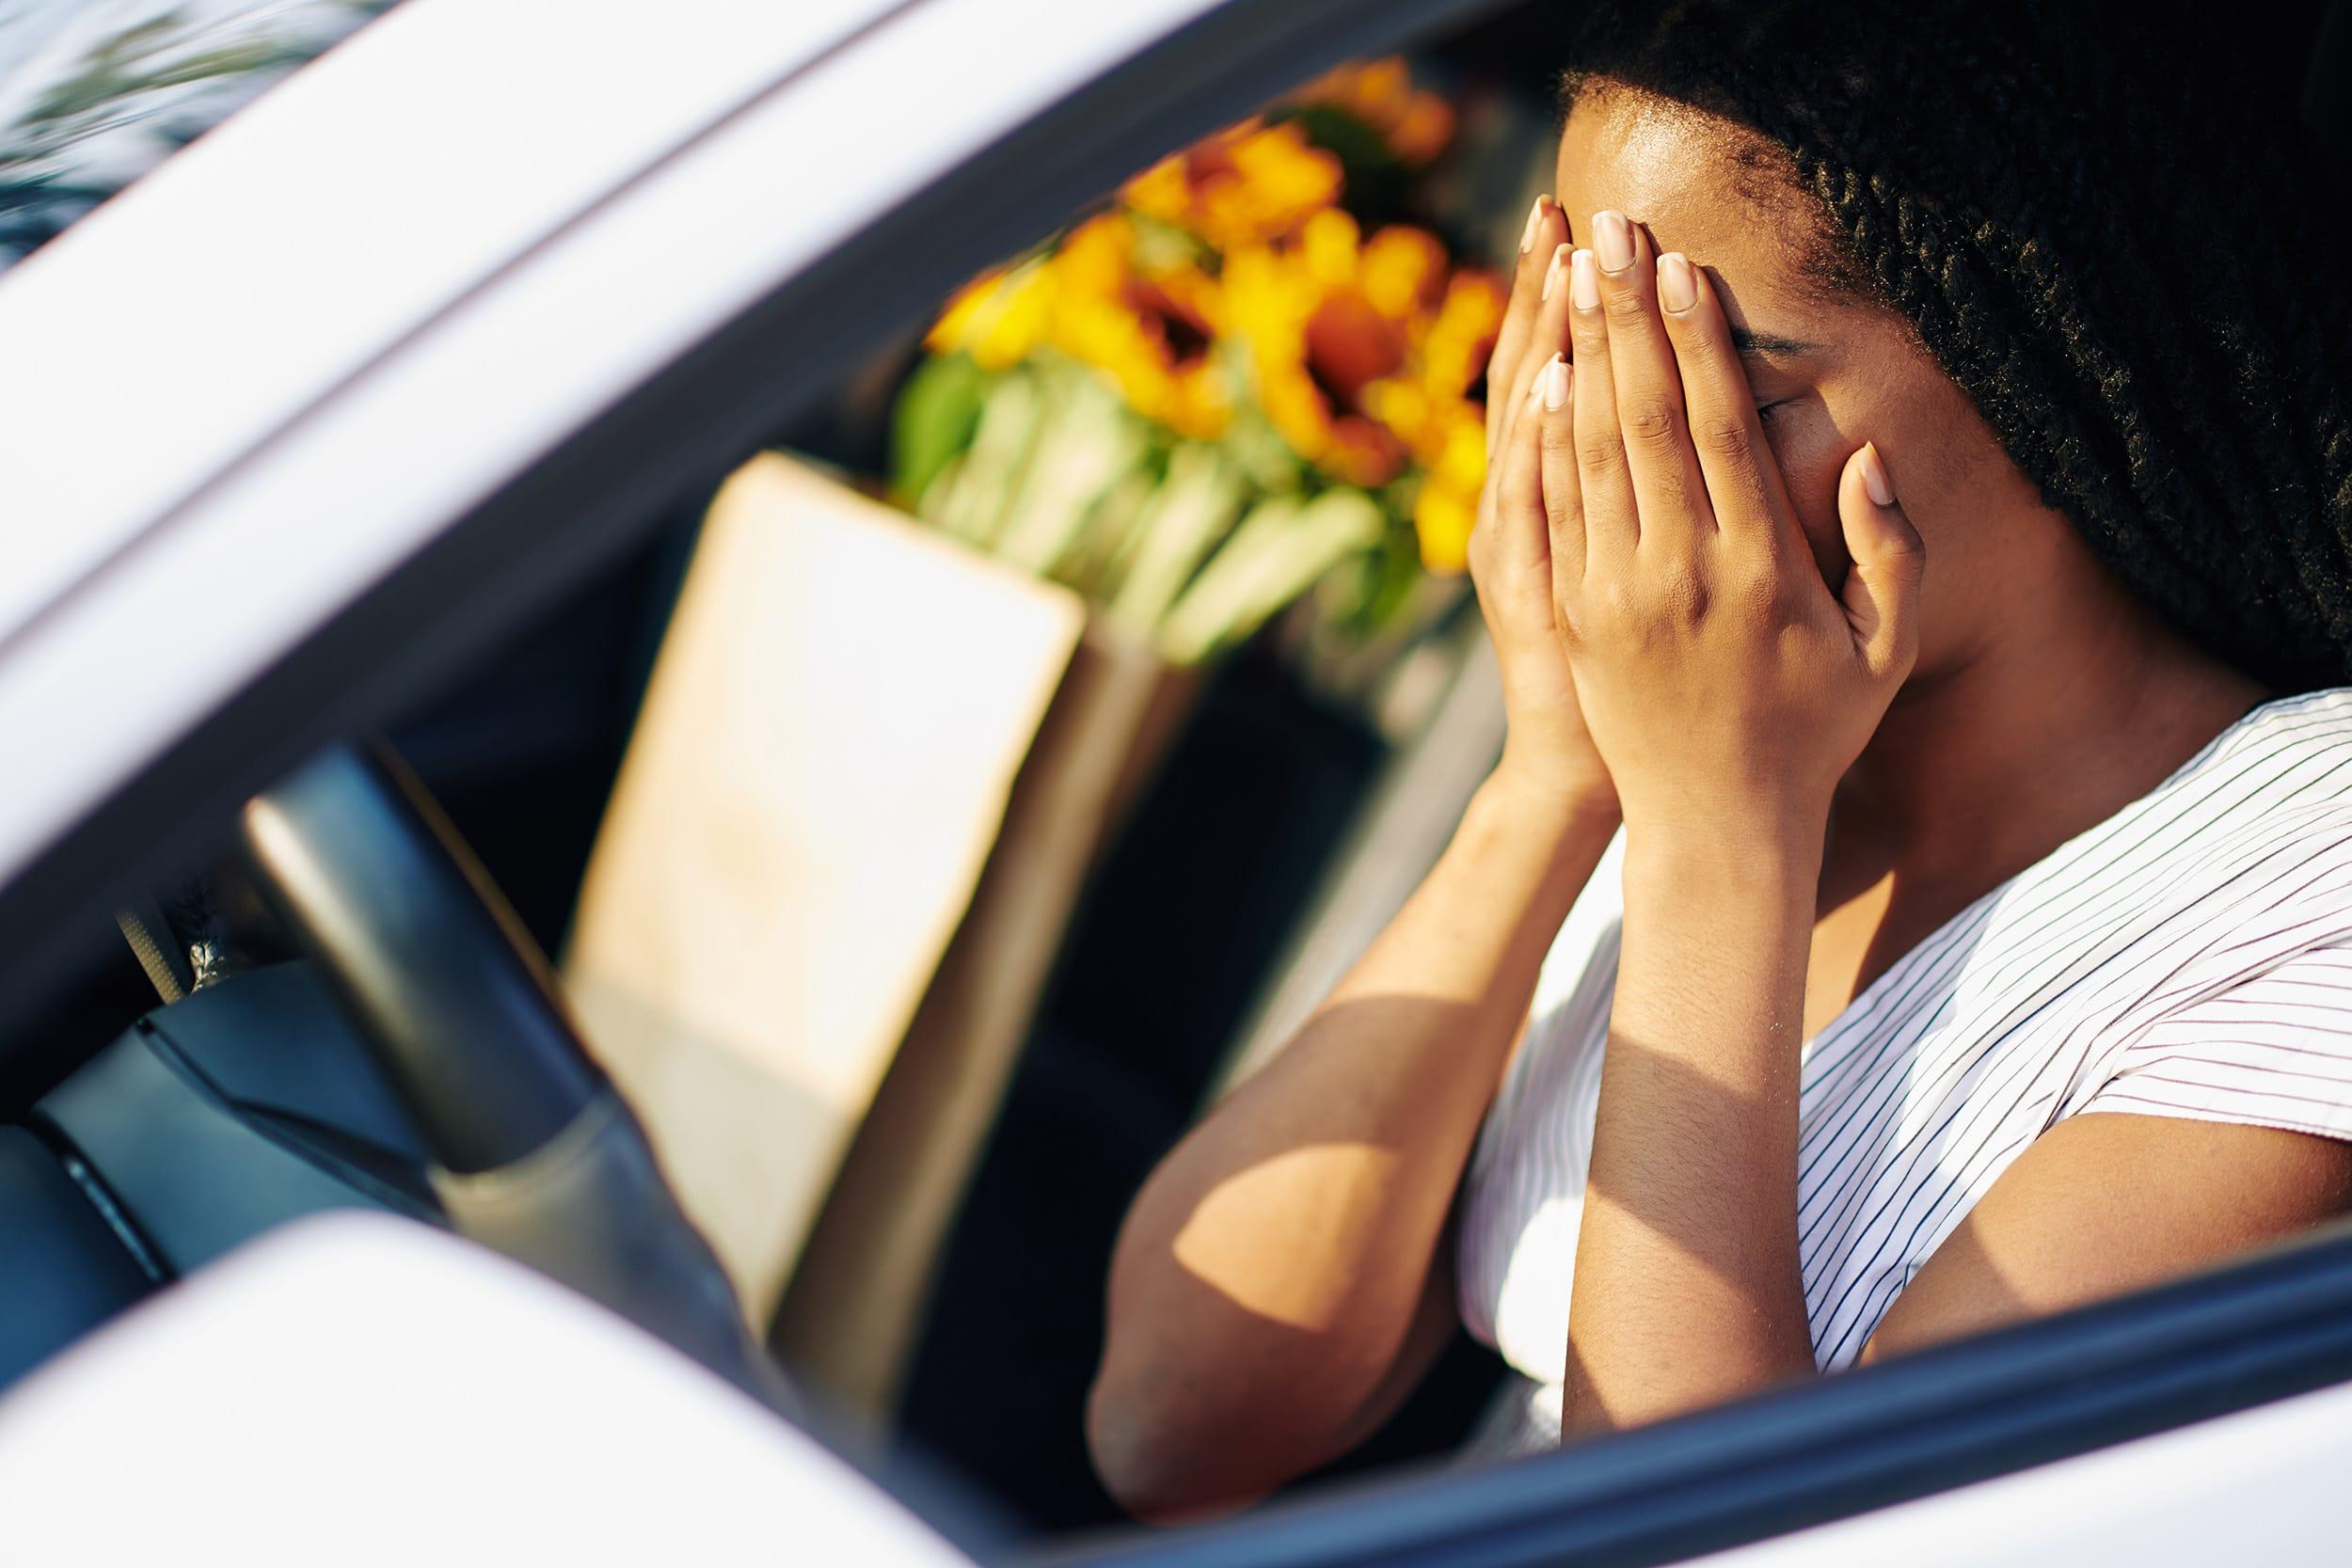 Verkehrsunfall Parkunfall Wie verhalte ich mich?